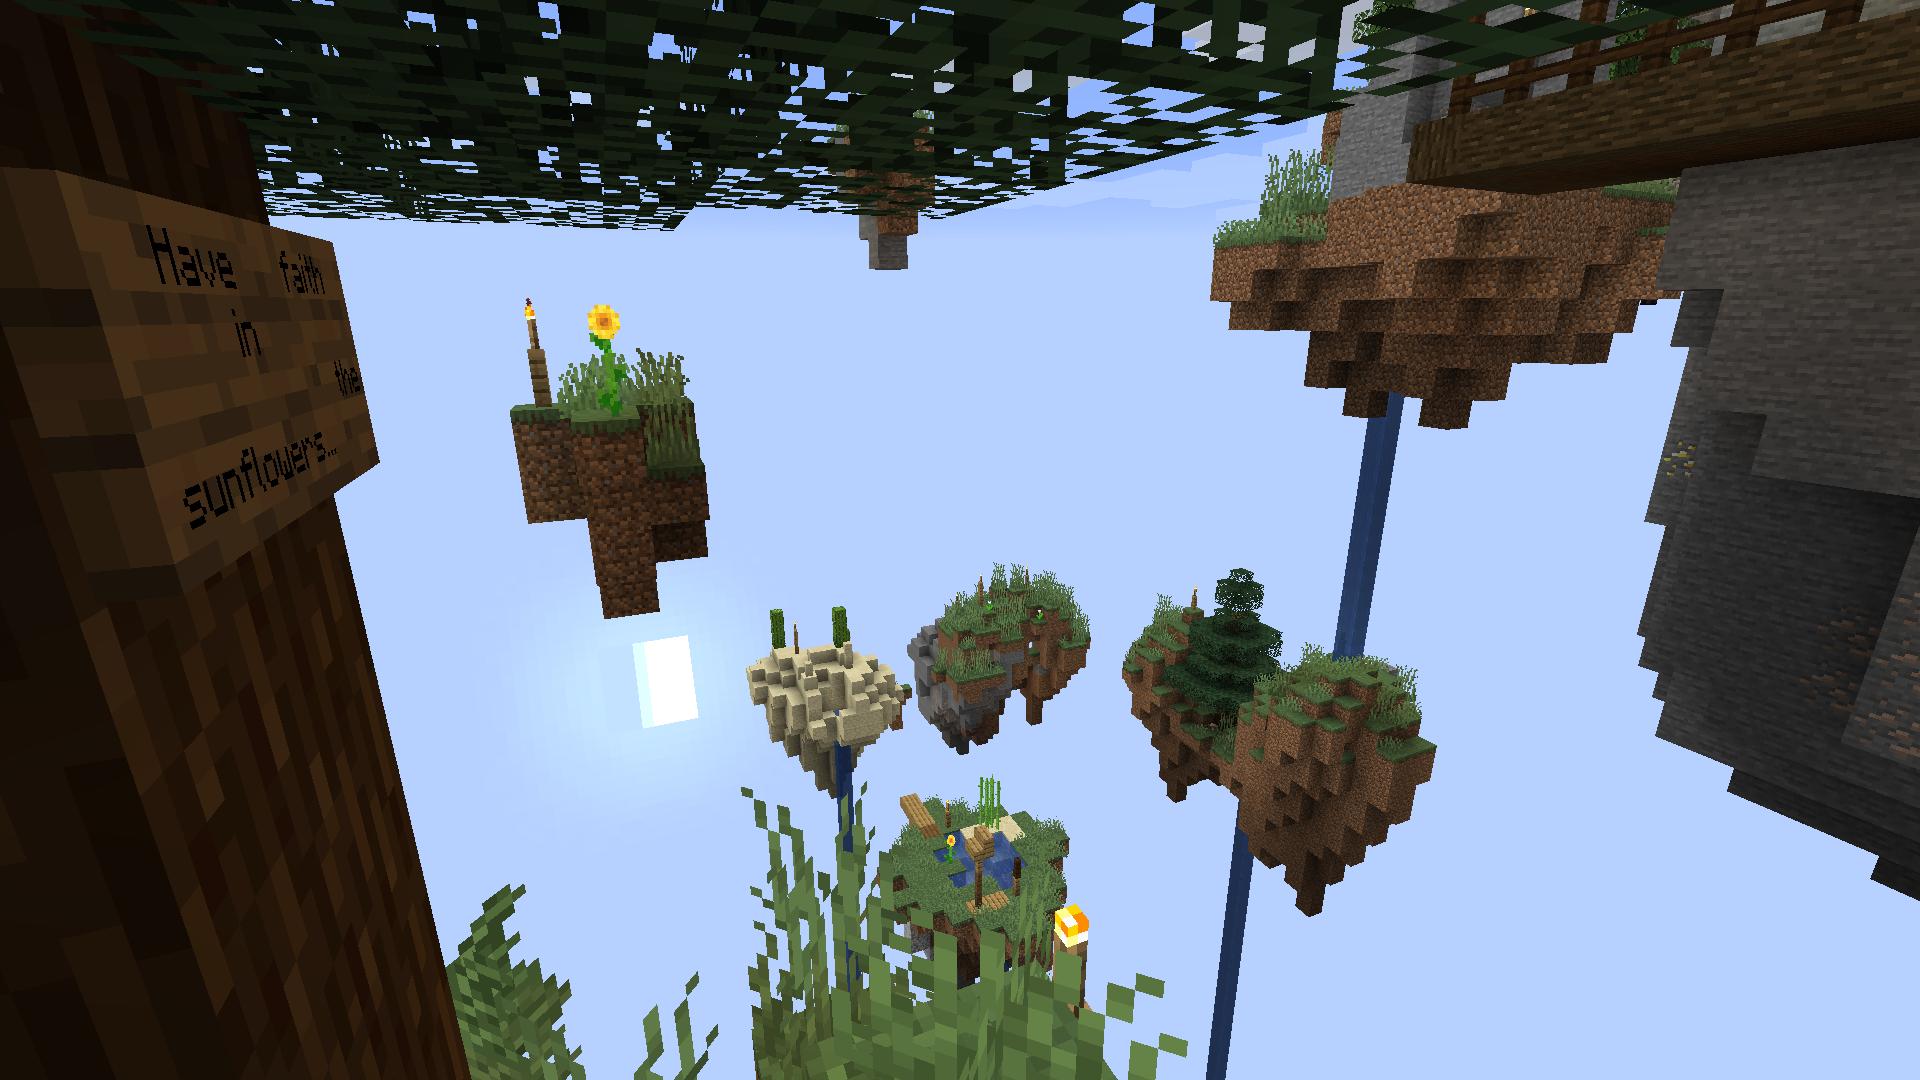 Quelques îles volantes, thème principal de la map.